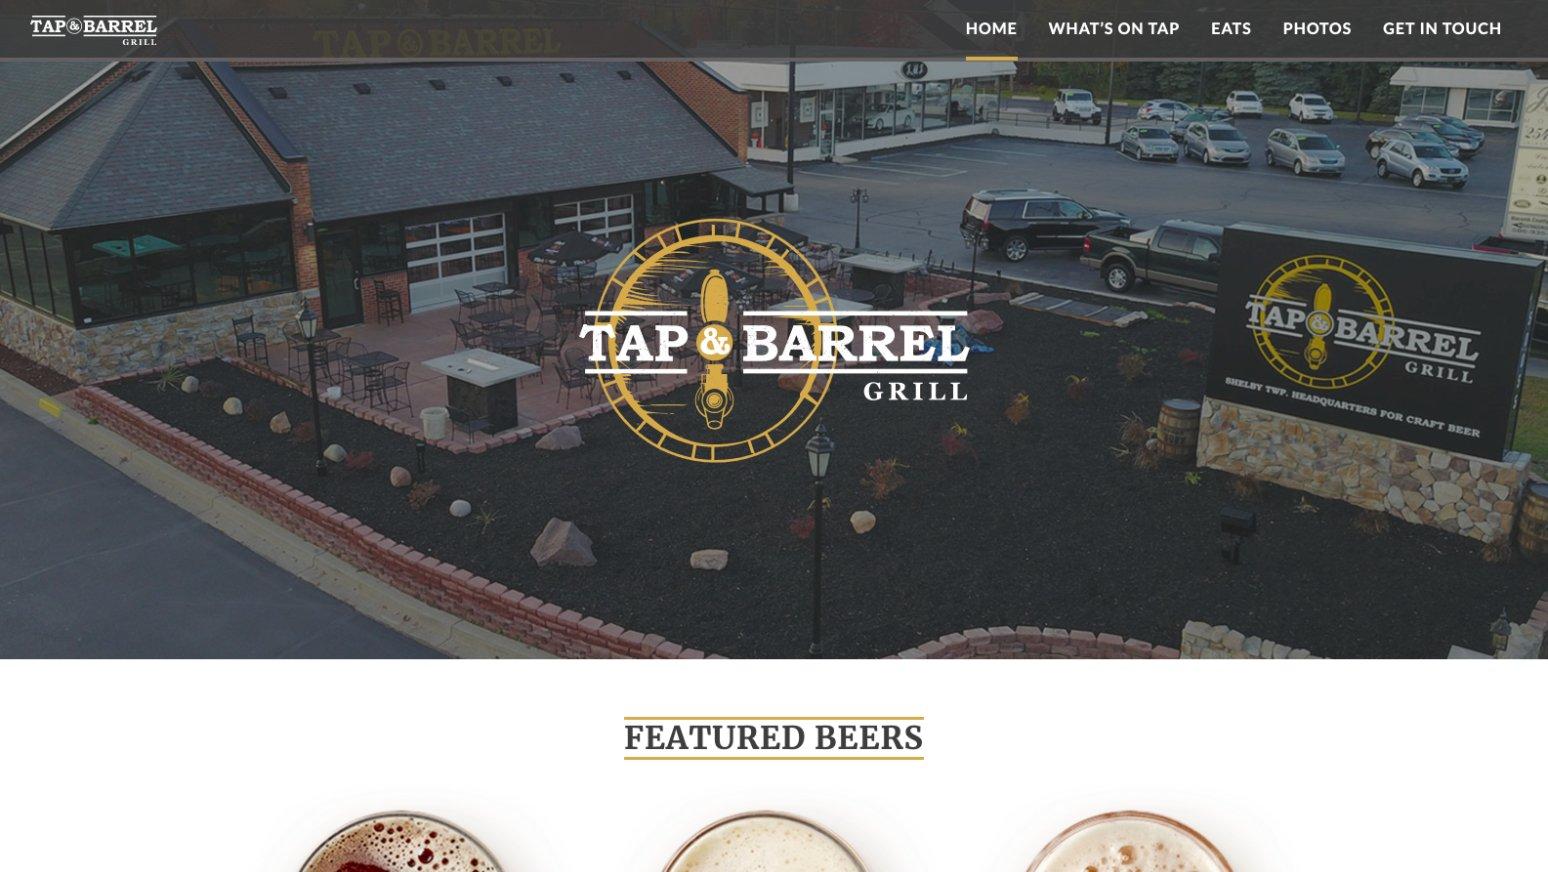 Tap & Barrel Grill